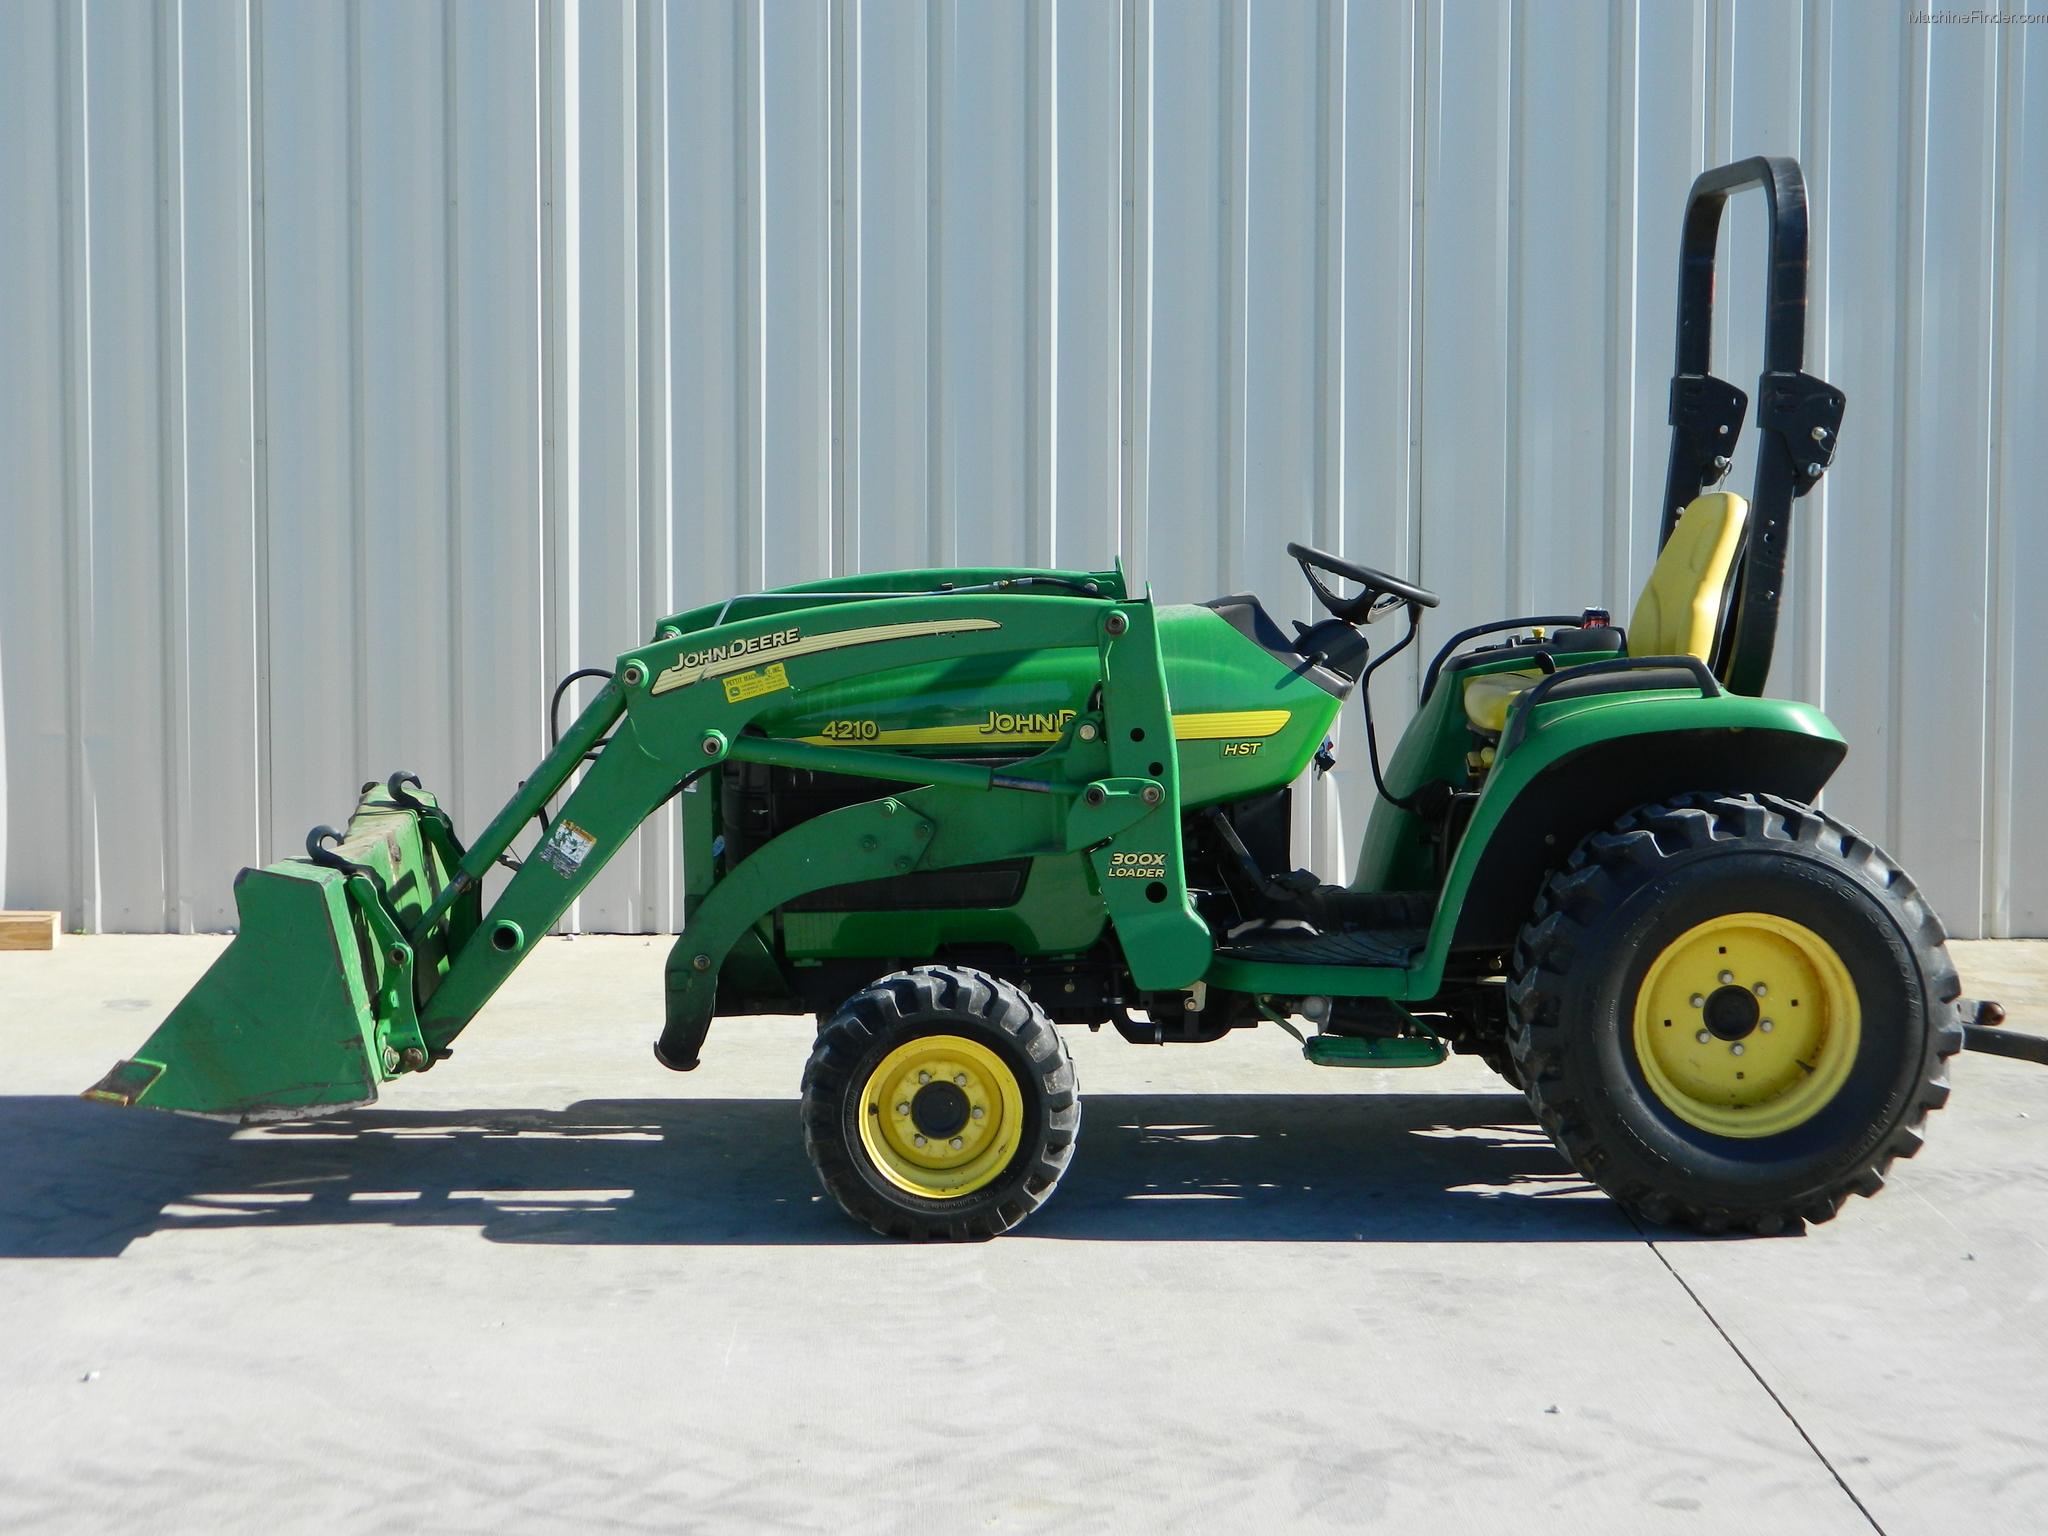 2004 John Deere 4210 Tractors - Compact (1-40hp.) - John ...